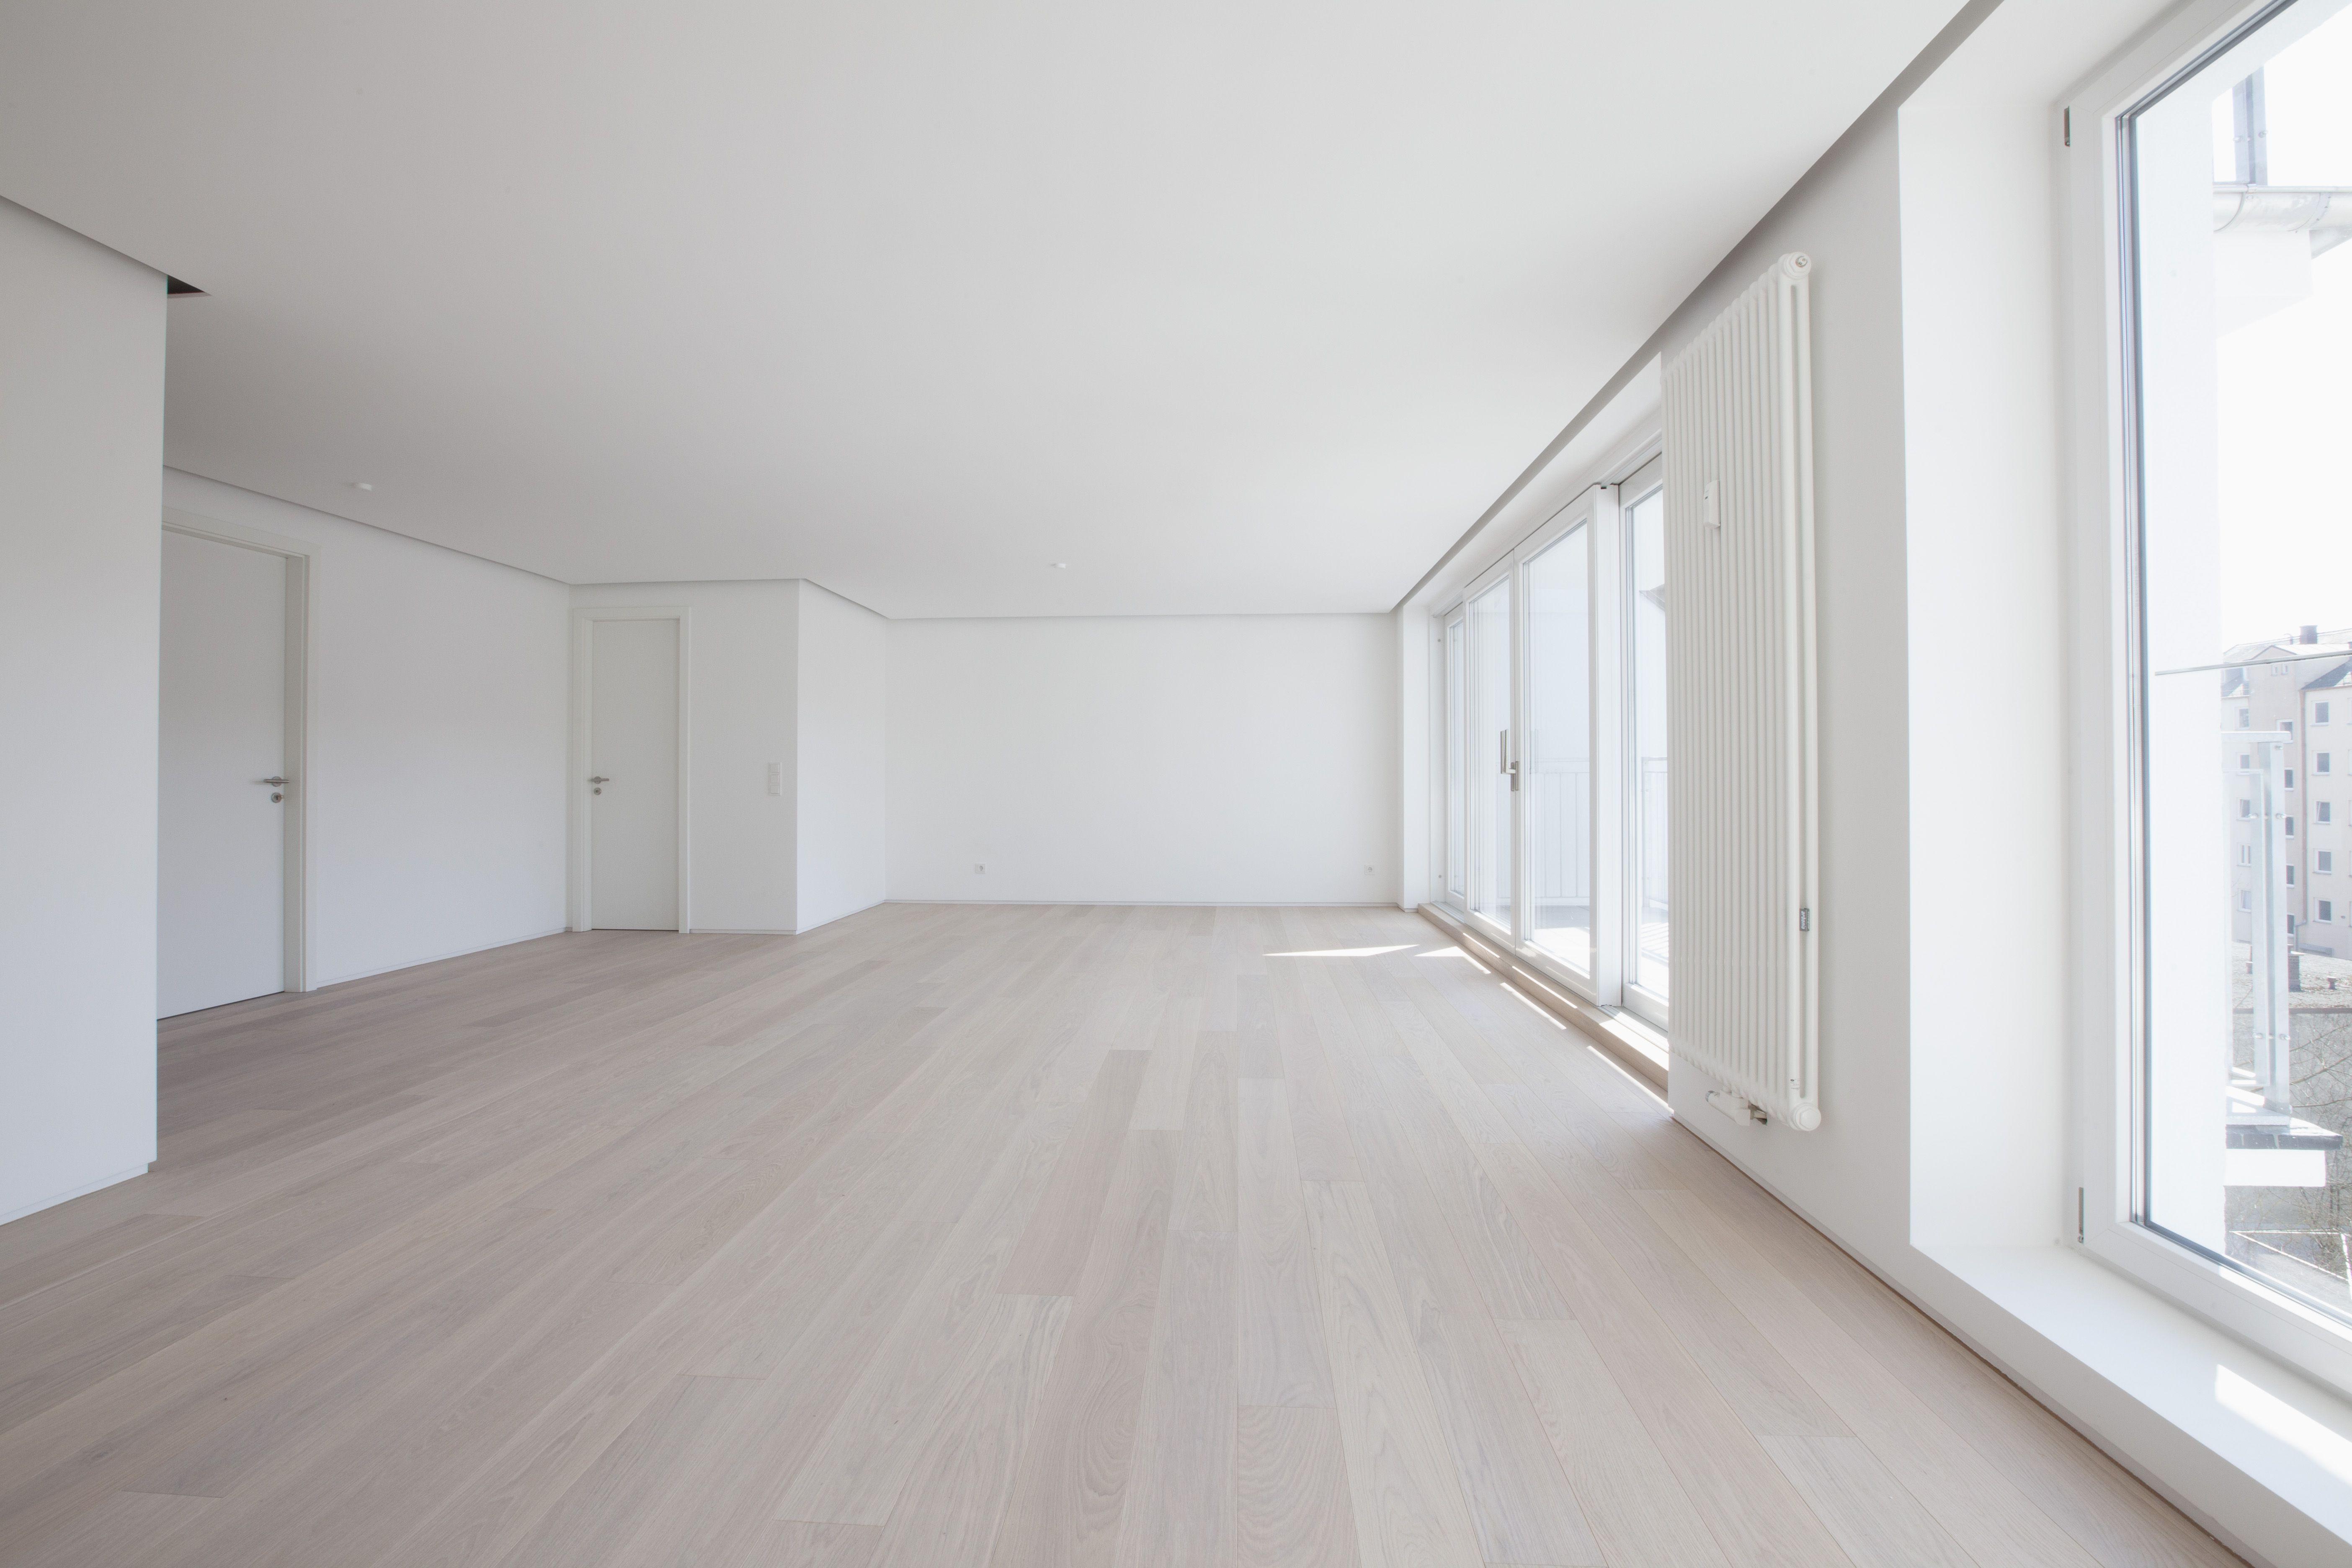 bruce locking engineered hardwood flooring of basics of favorite hybrid engineered wood floors within empty living room in modern apartment 578189139 58866f903df78c2ccdecab05